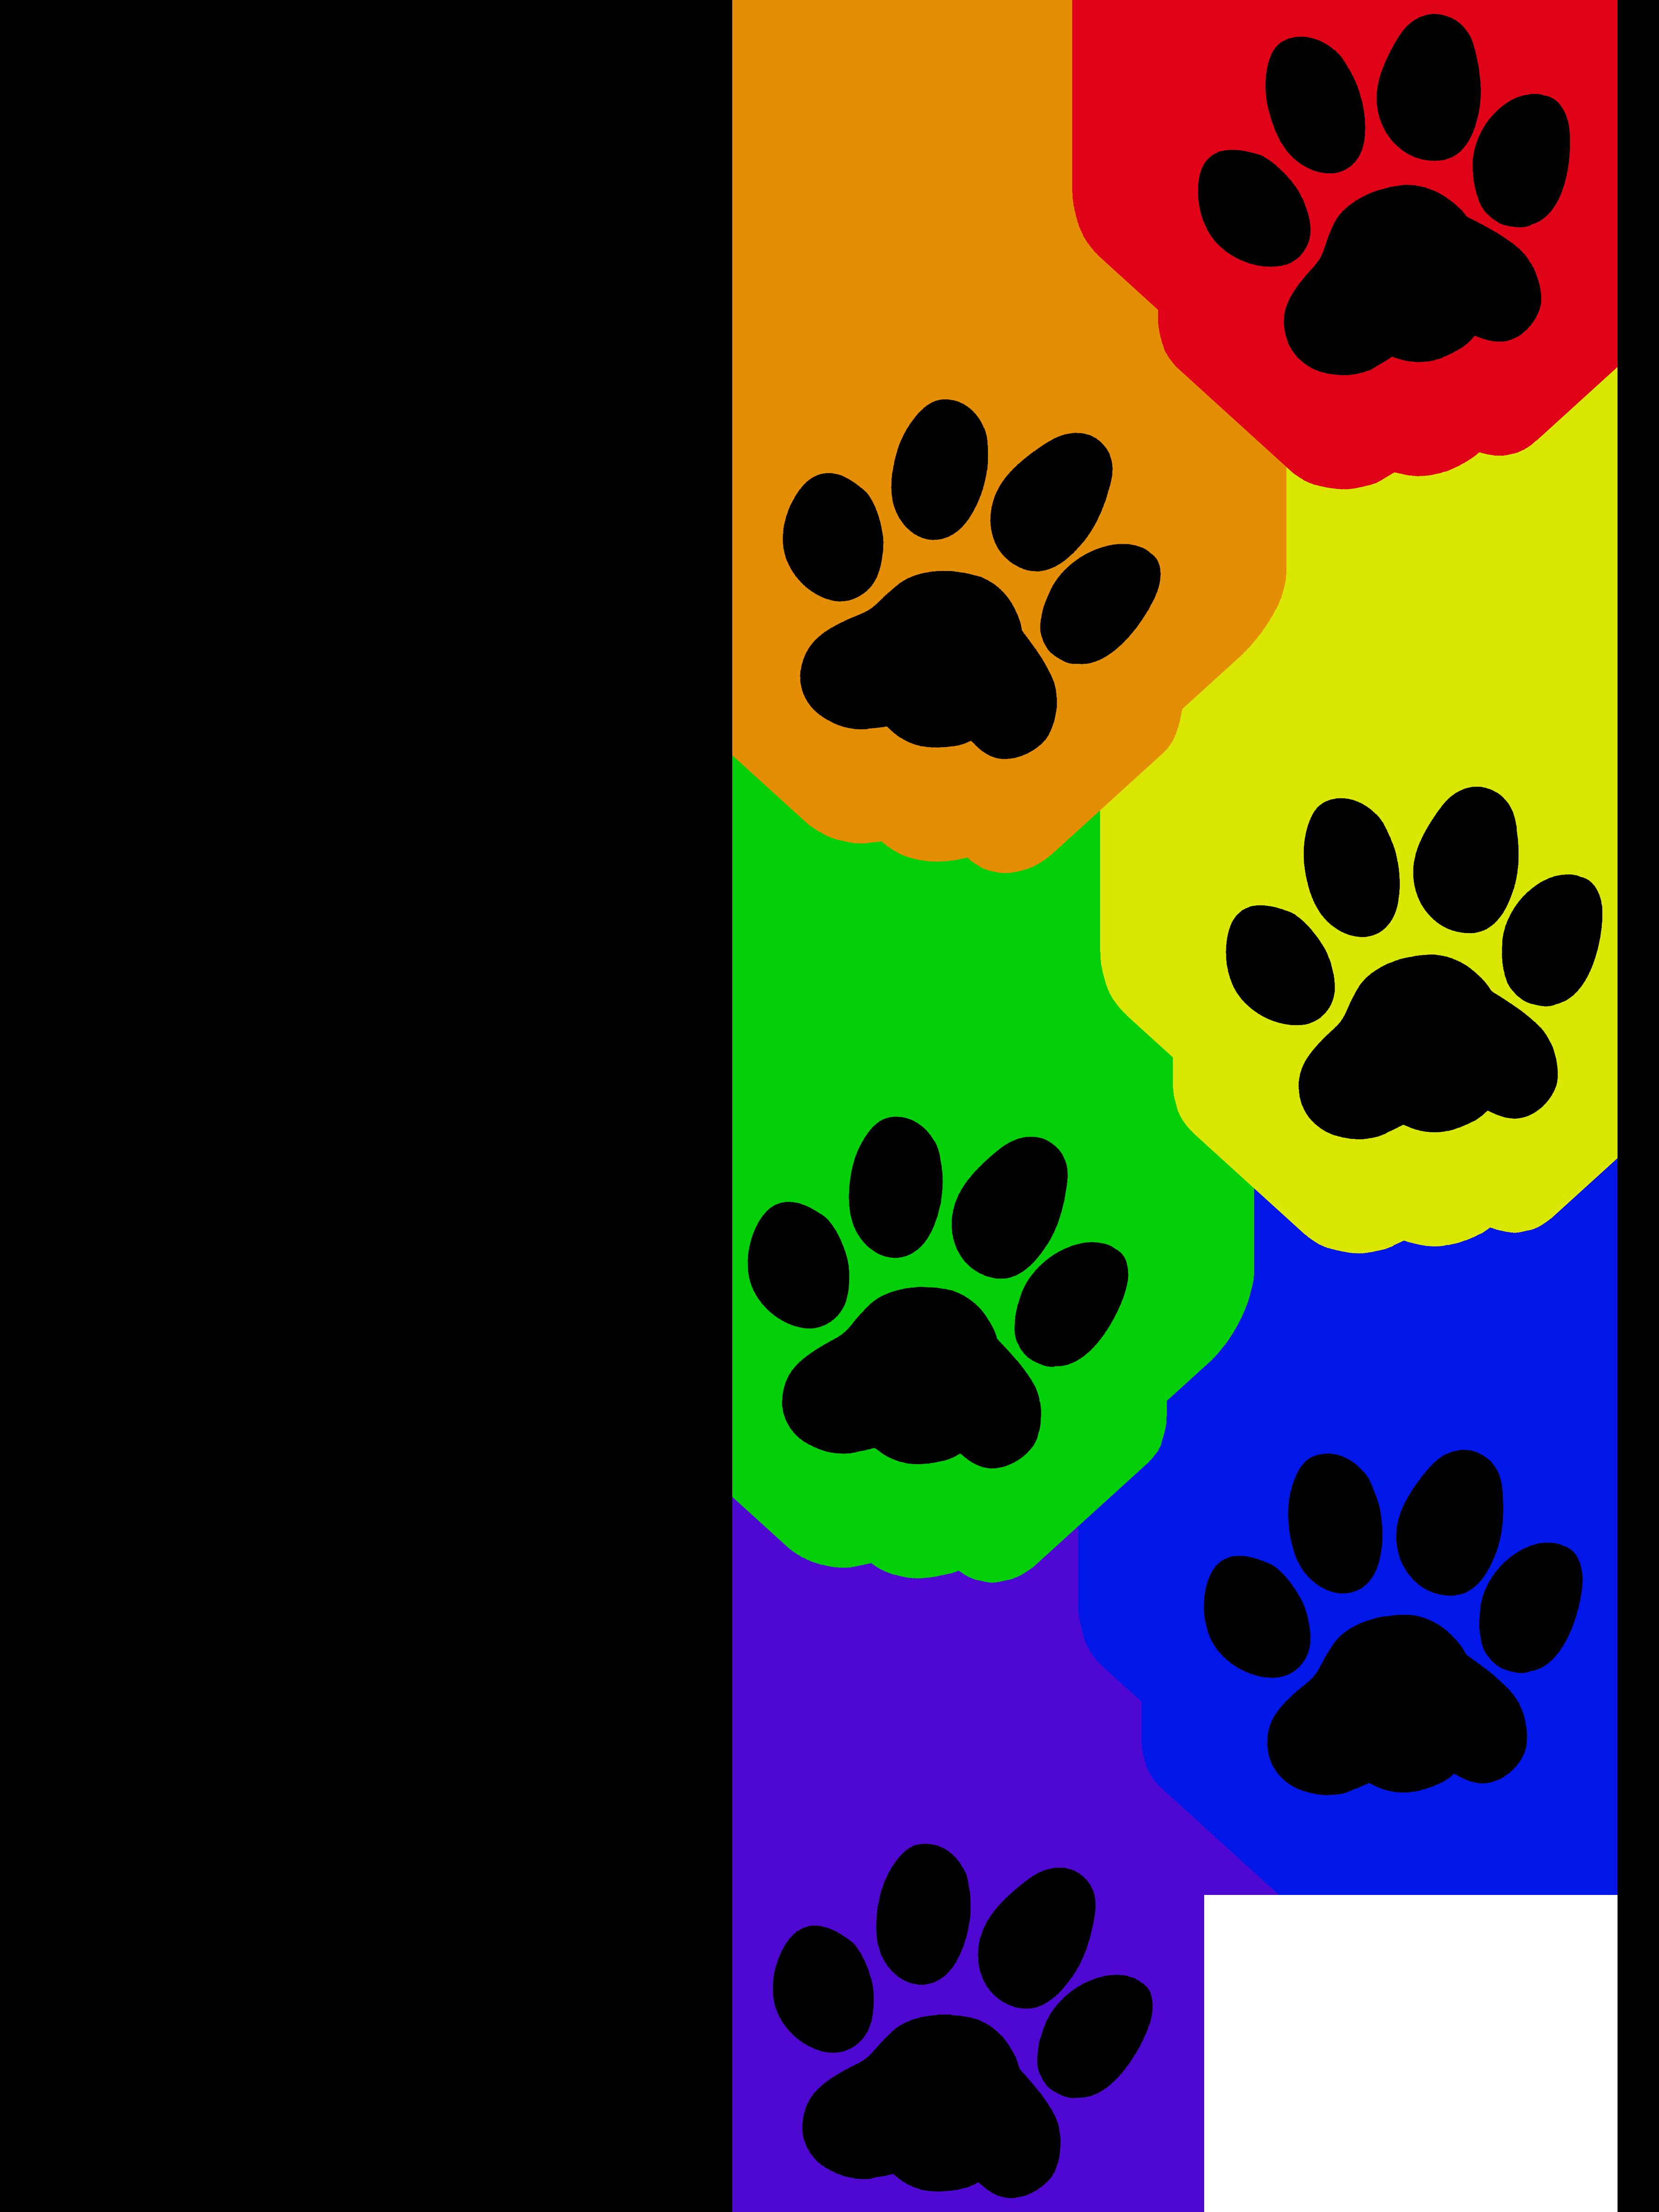 Cat paw clipart jpg free Cat paw print - Rainbow | Artworktee jpg free